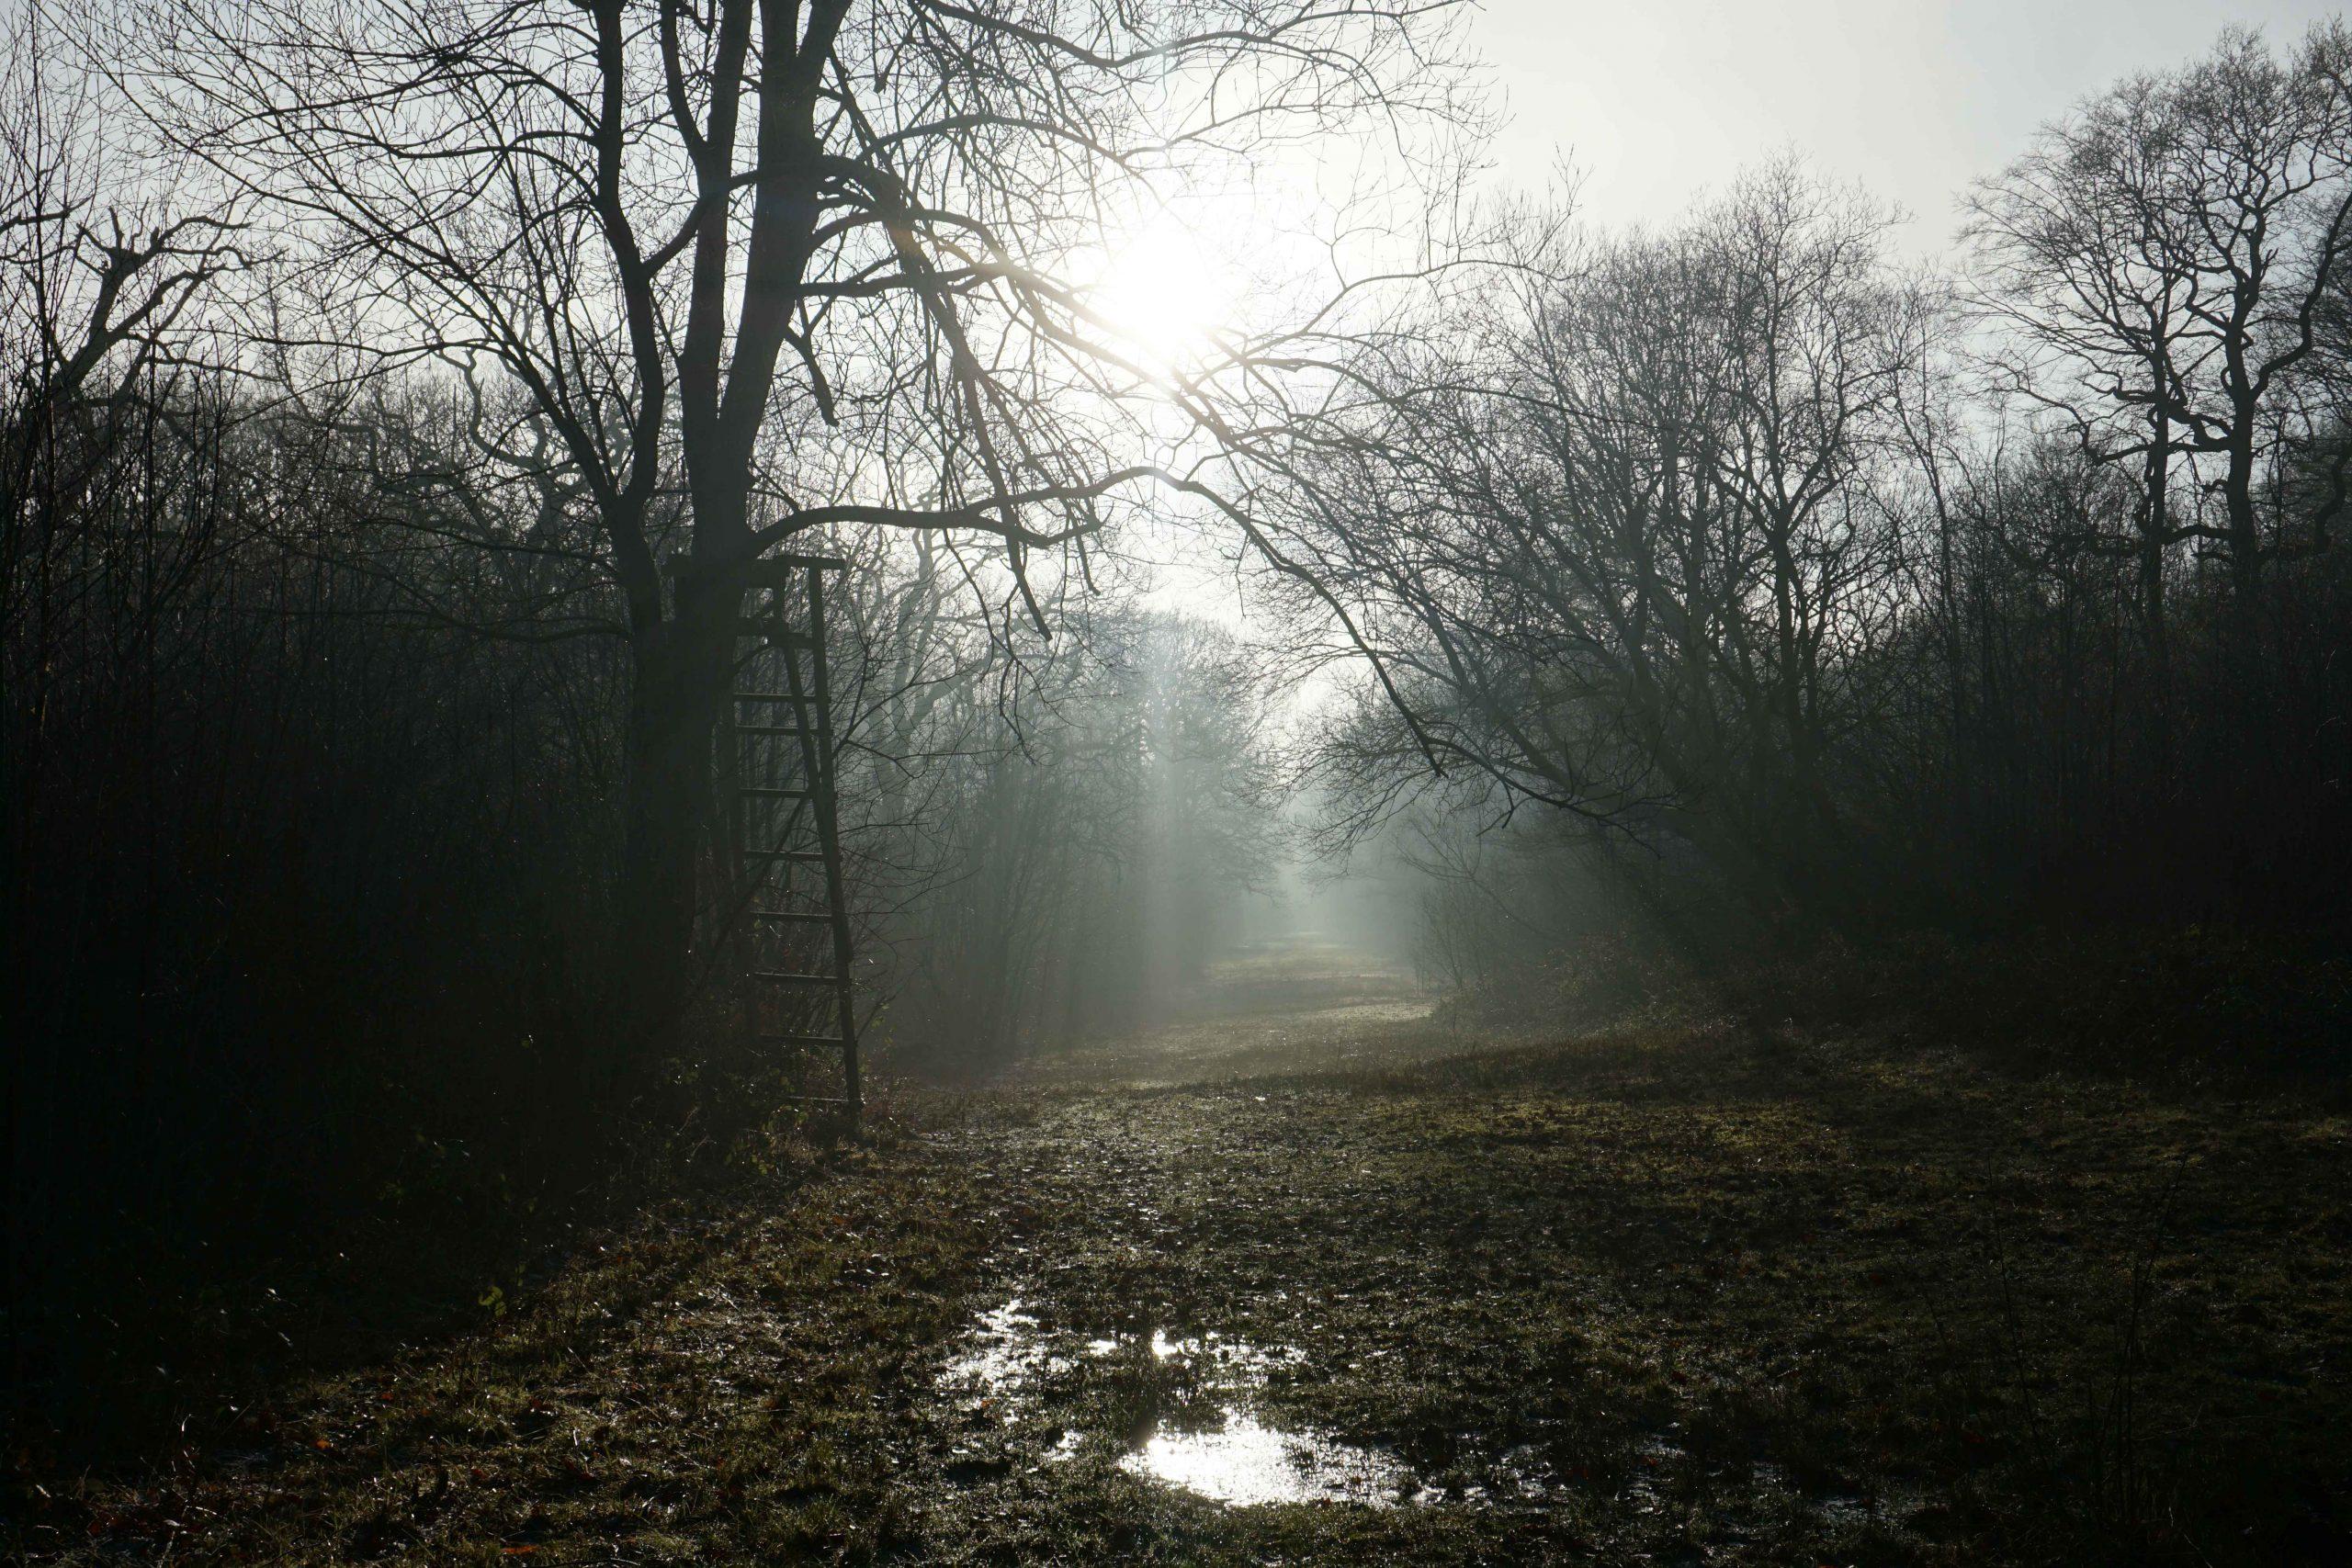 Nature Reserve Spotlight: Ryton Wood